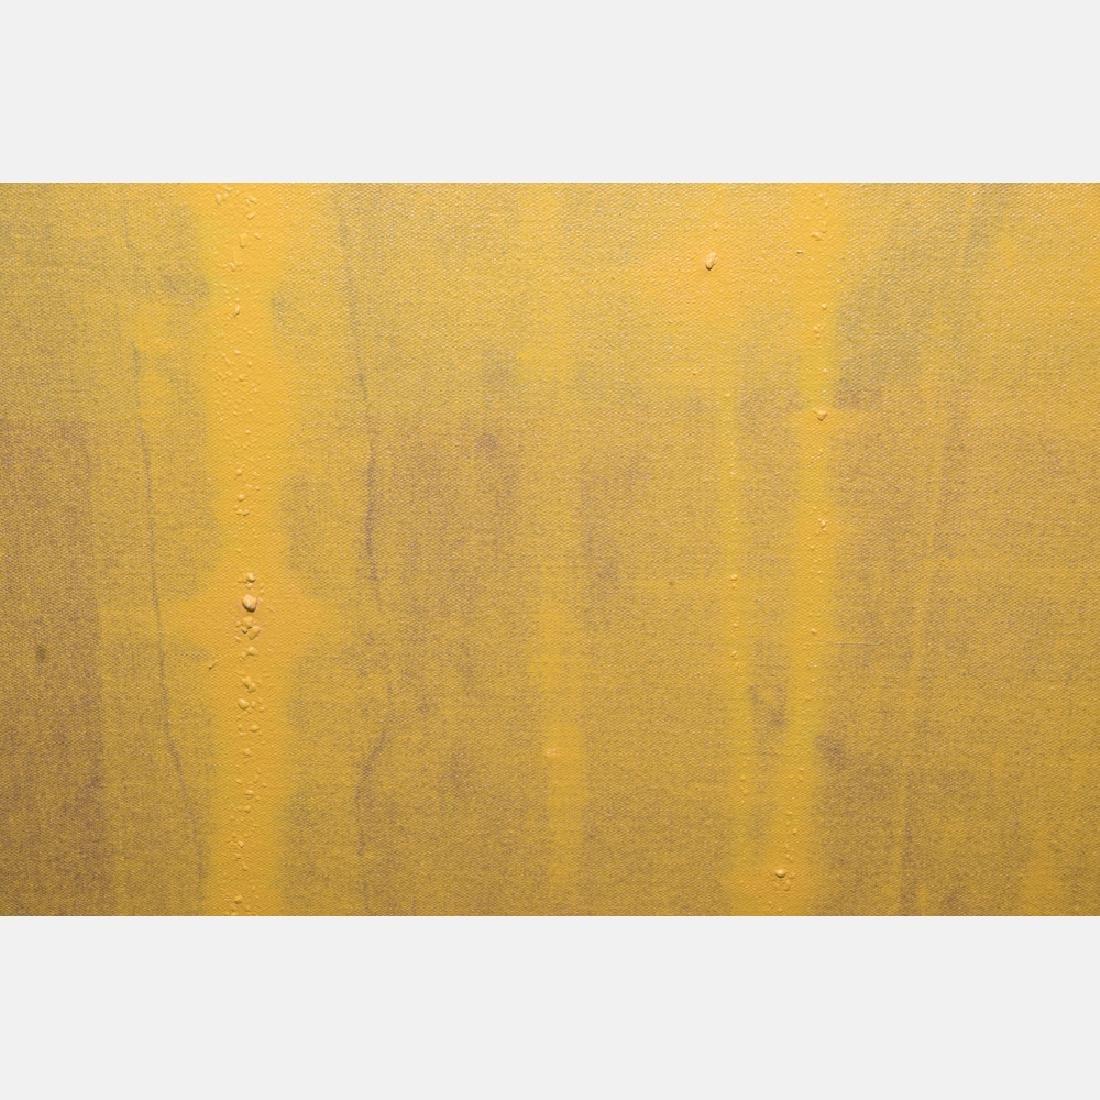 William Pettet (b. 1942) Duke, Acrylic on canvas. - 4